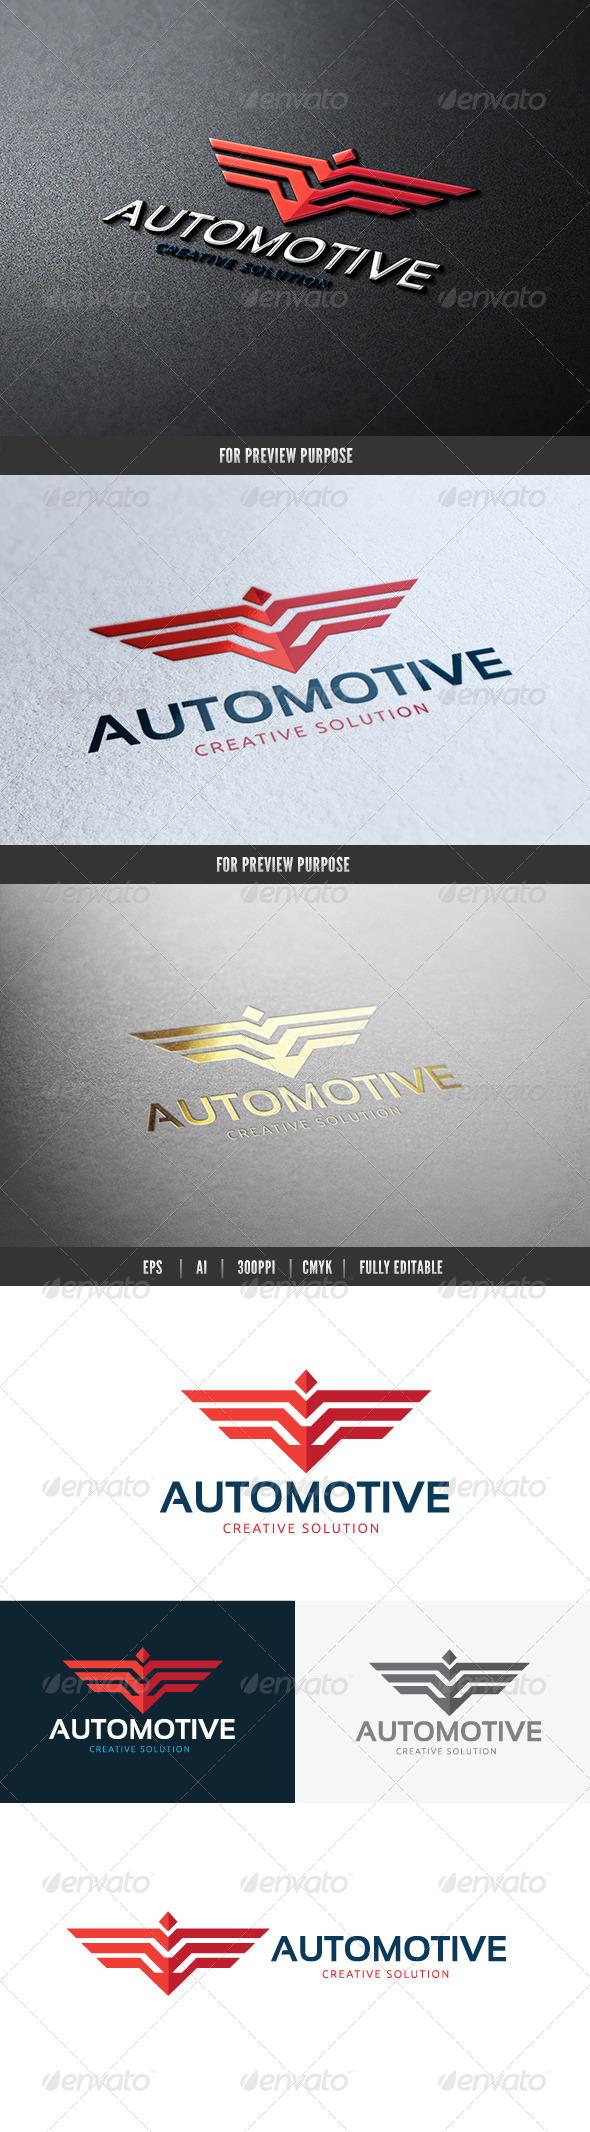 Automotive Creative Solution Logo